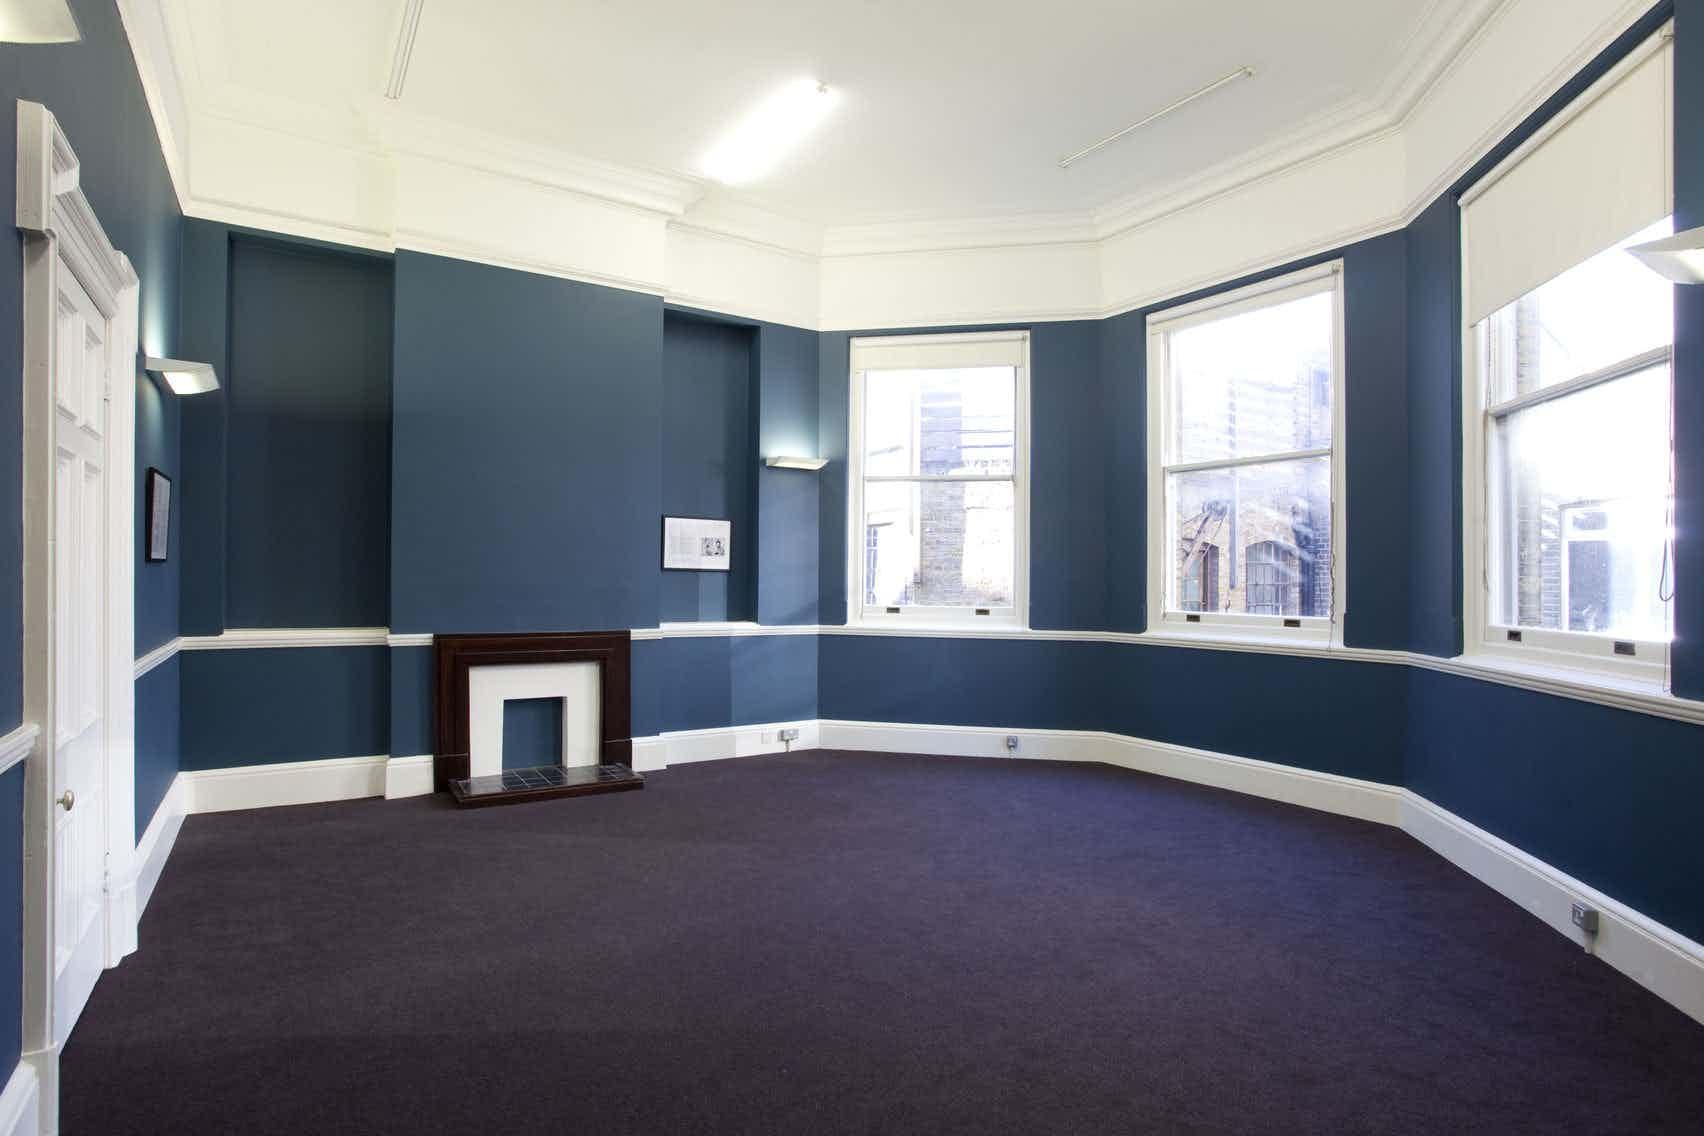 Medium Committee Room, Shoreditch Town Hall